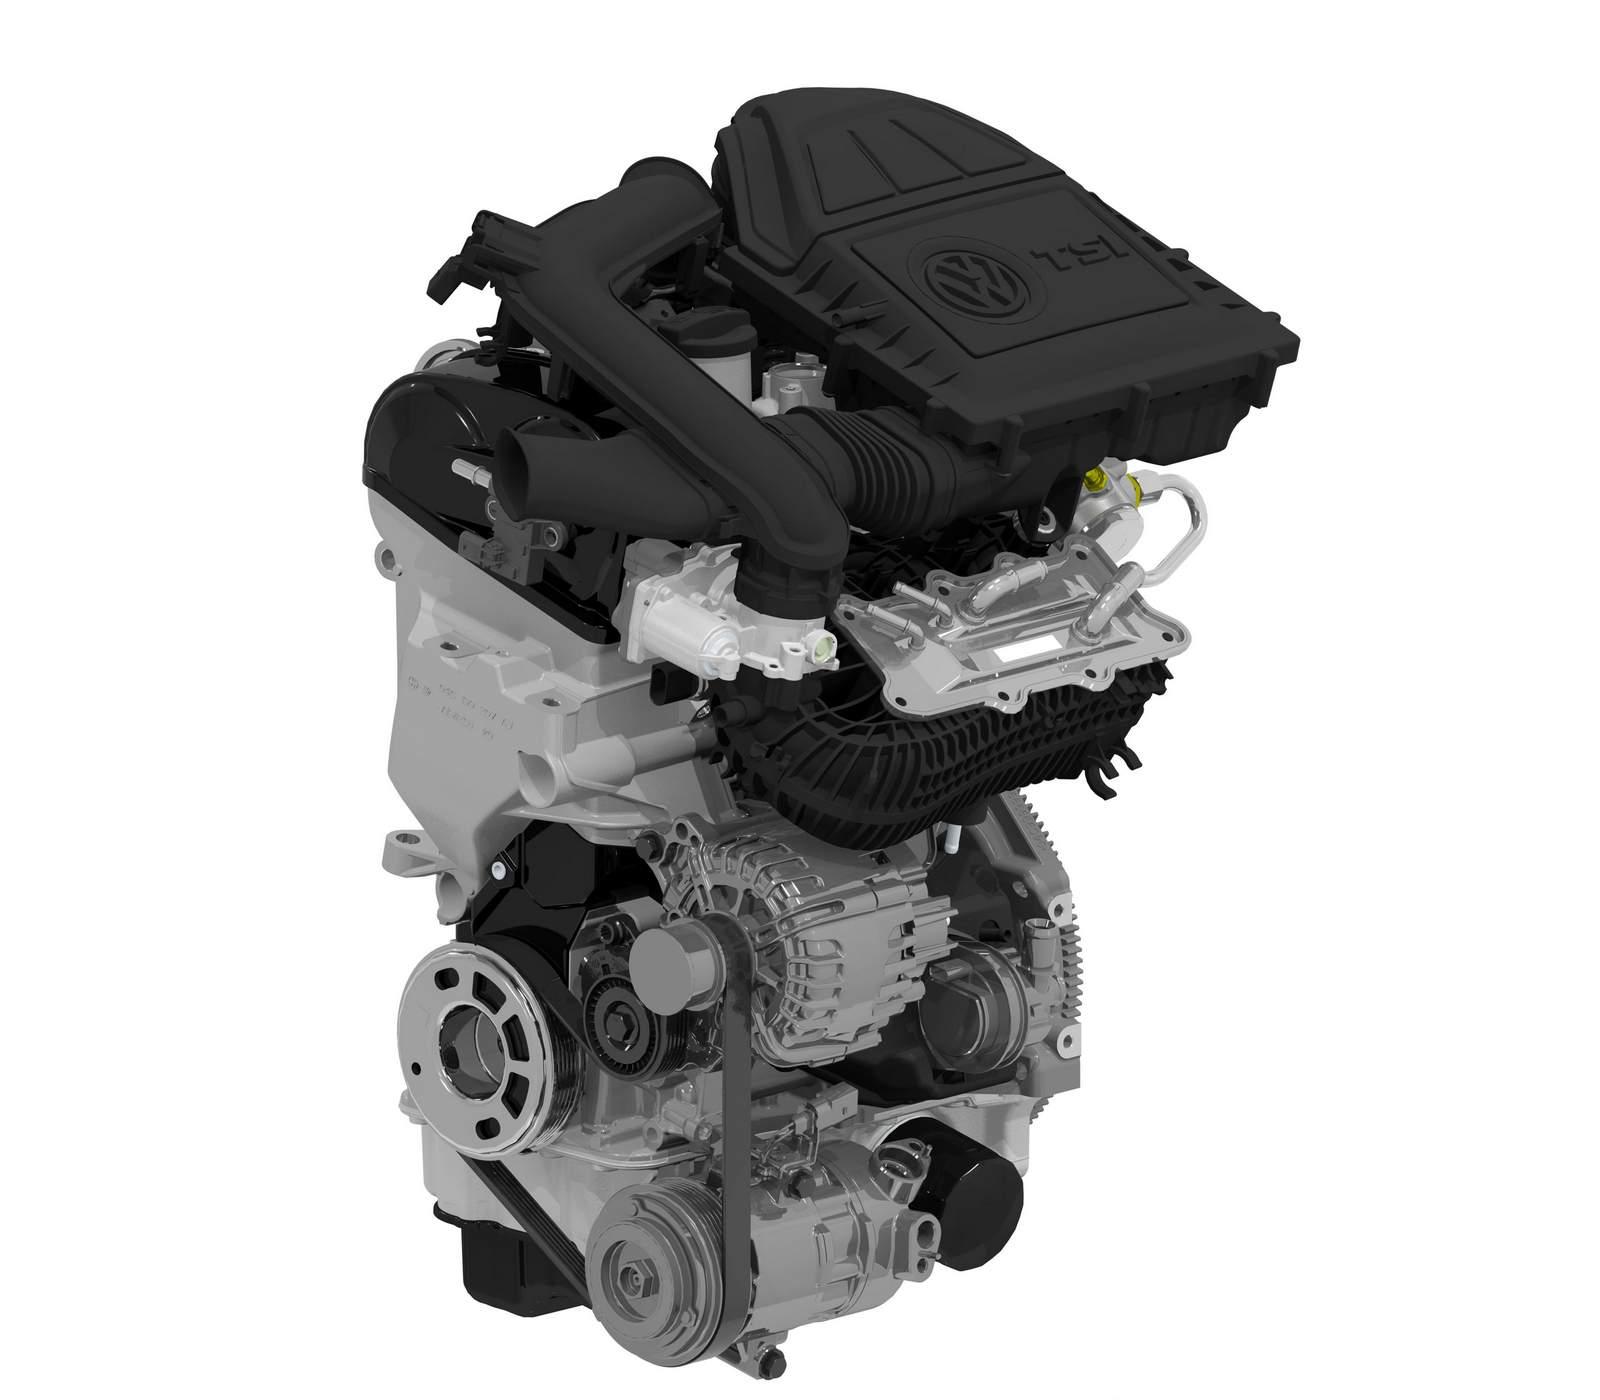 vw-up-tsi-with-105-hp-1-liter-turbo-laun